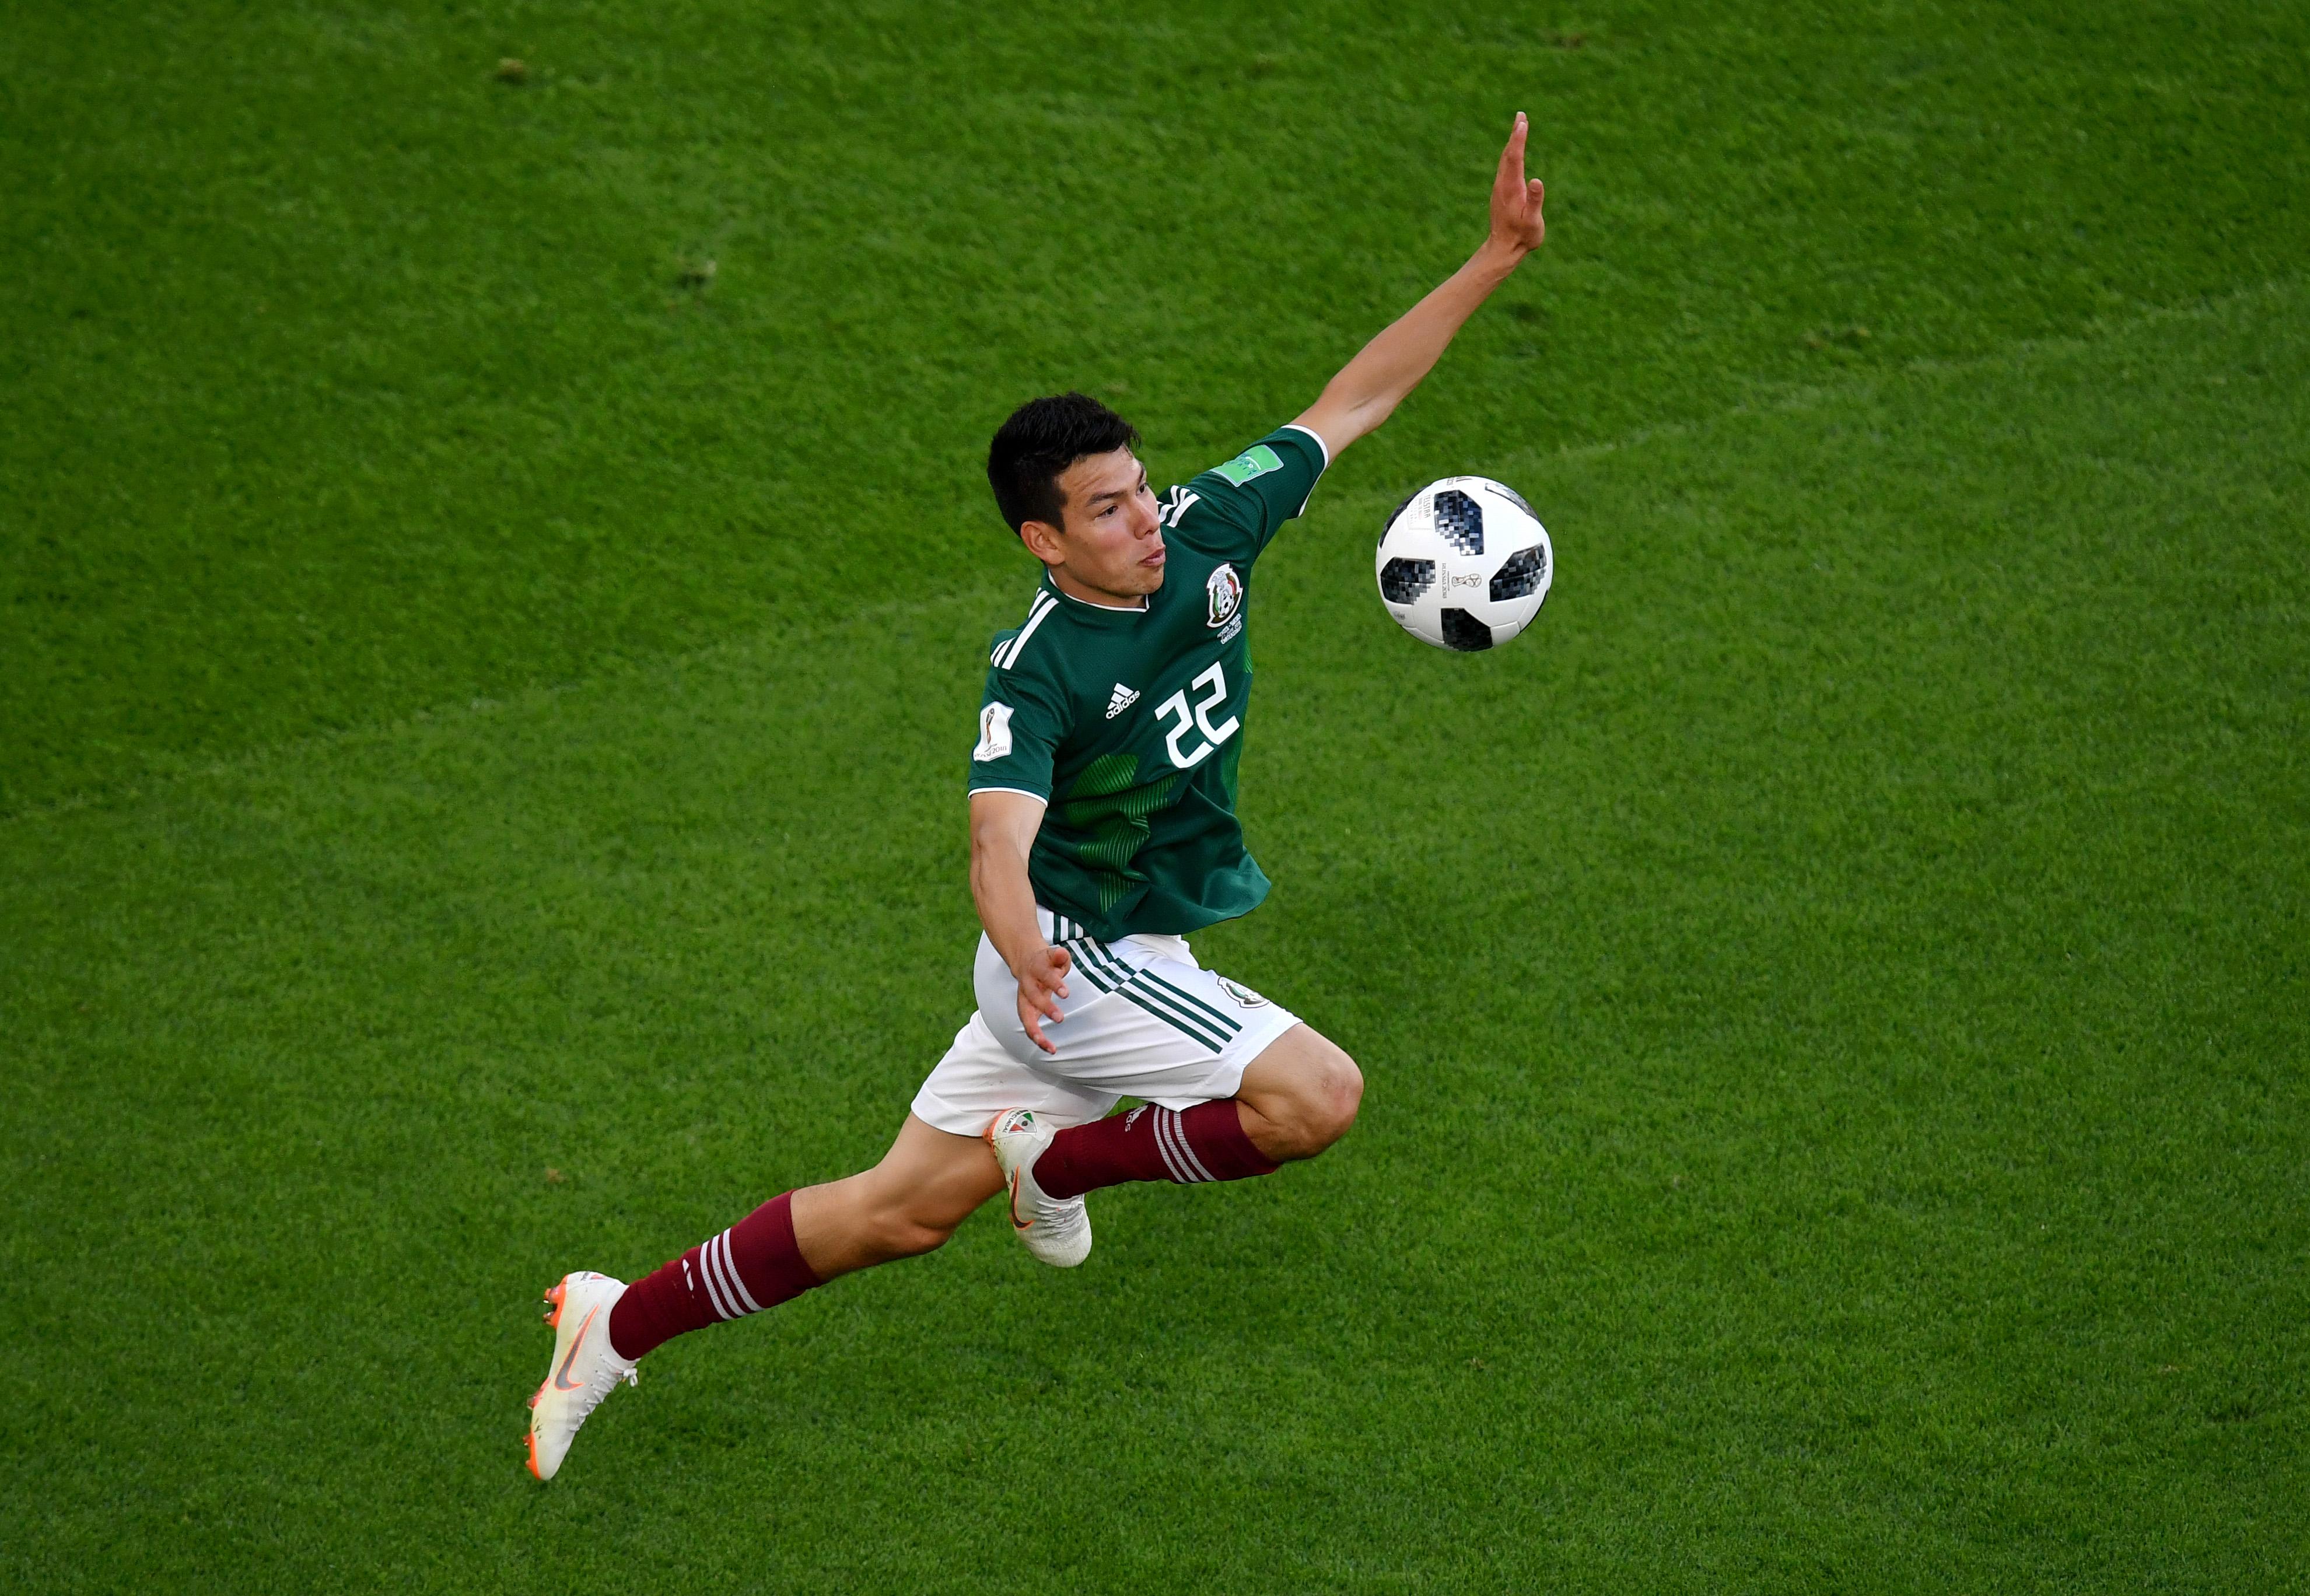 Hirving Lozano, Manchester United, Mundial, Fichaje